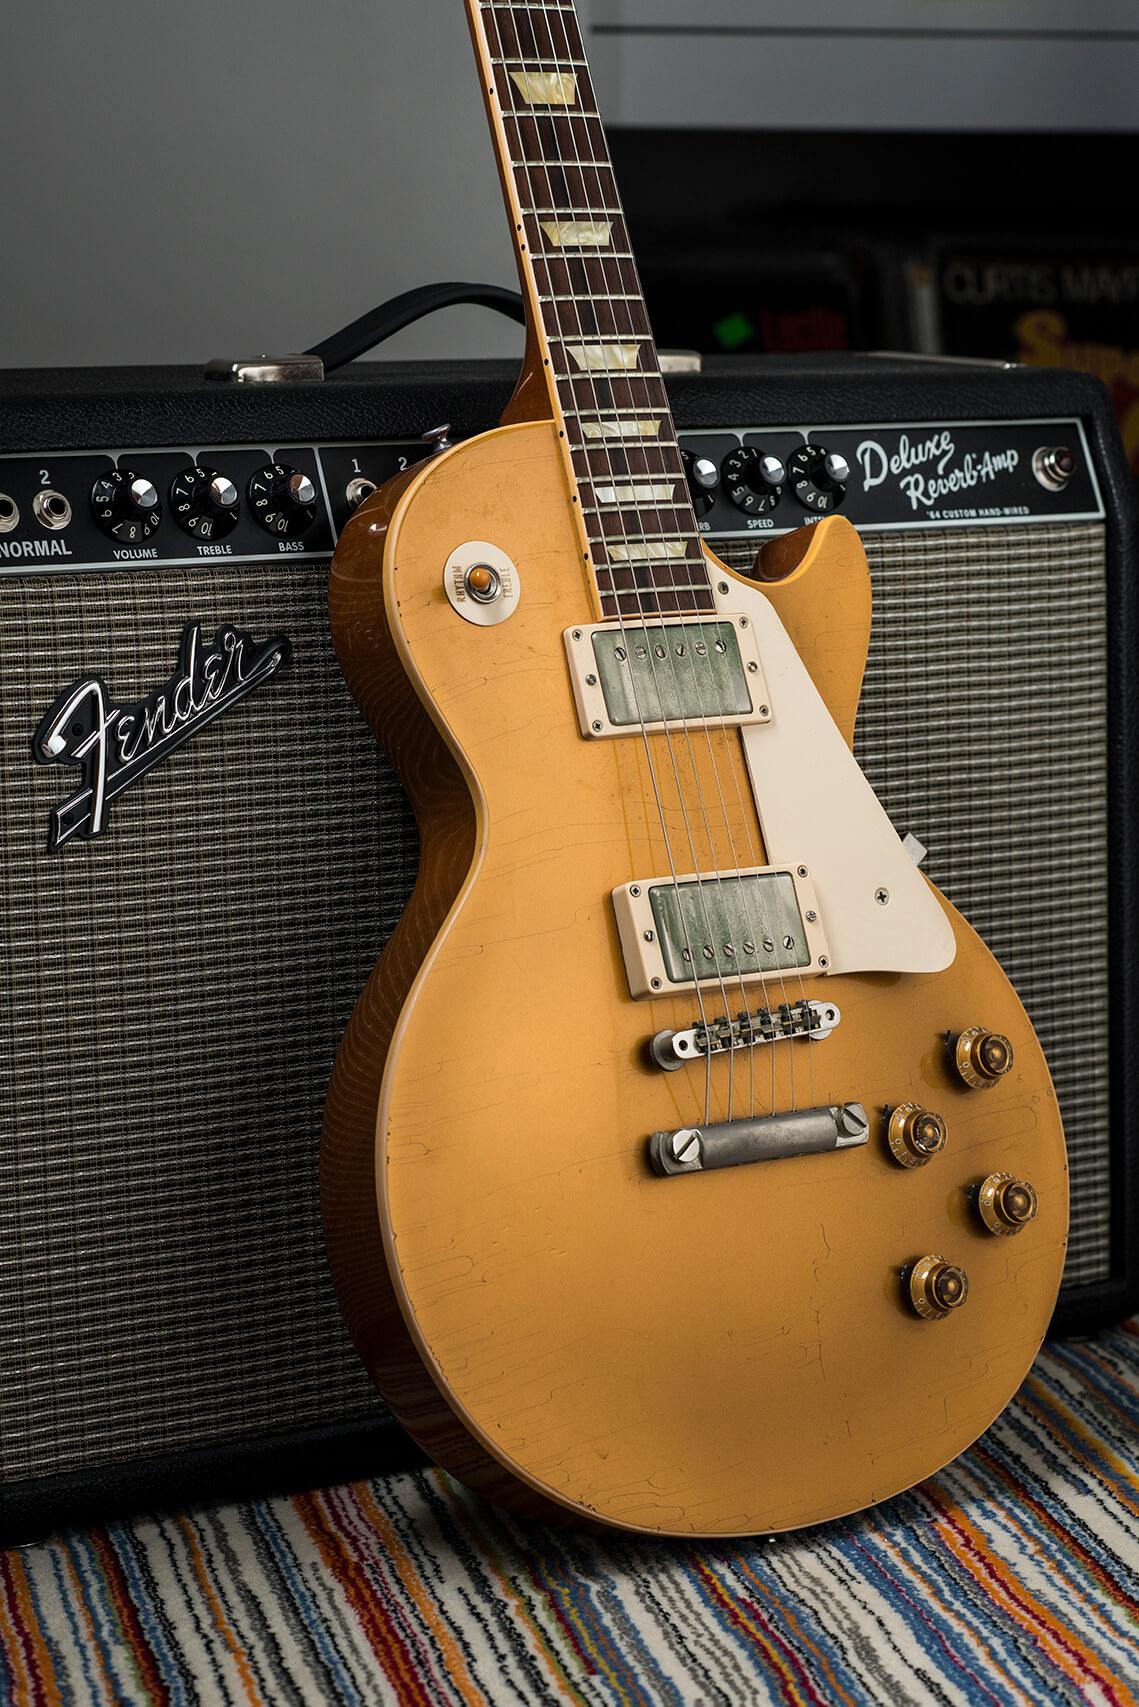 Jeff Garlin's Gibson Les Paul Goldtop Body